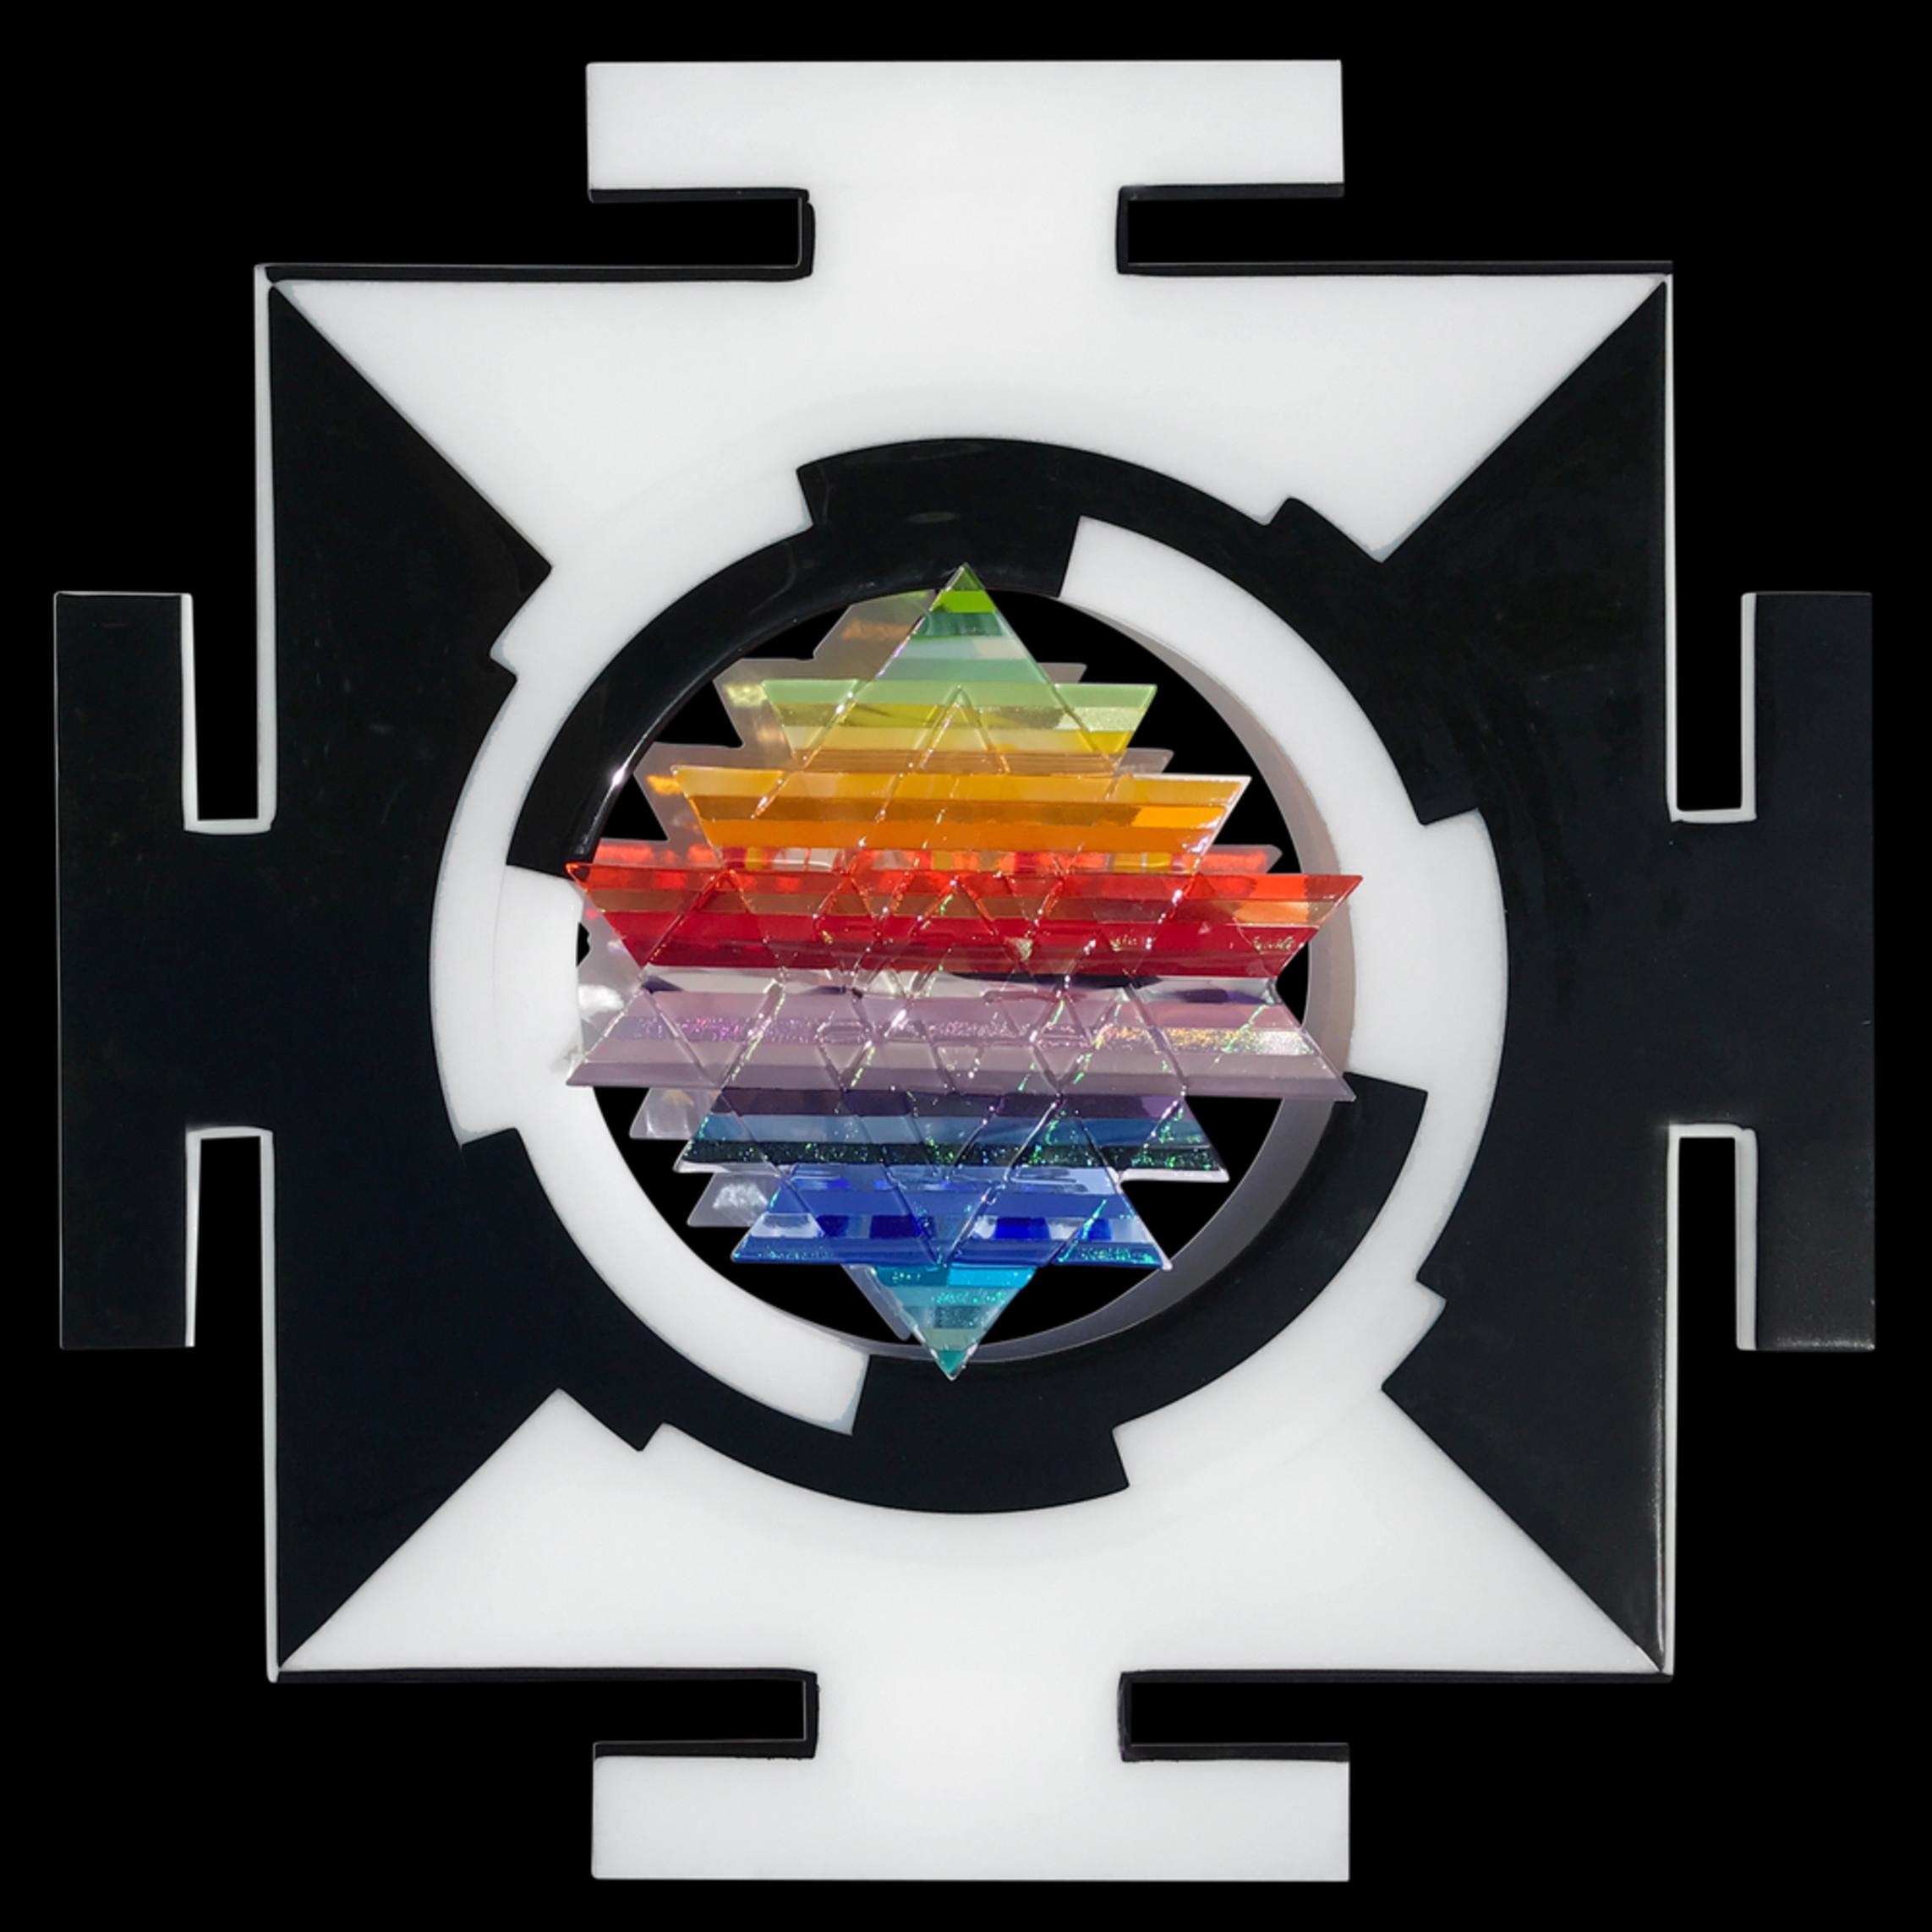 Sri yantra transparent black wr7qff